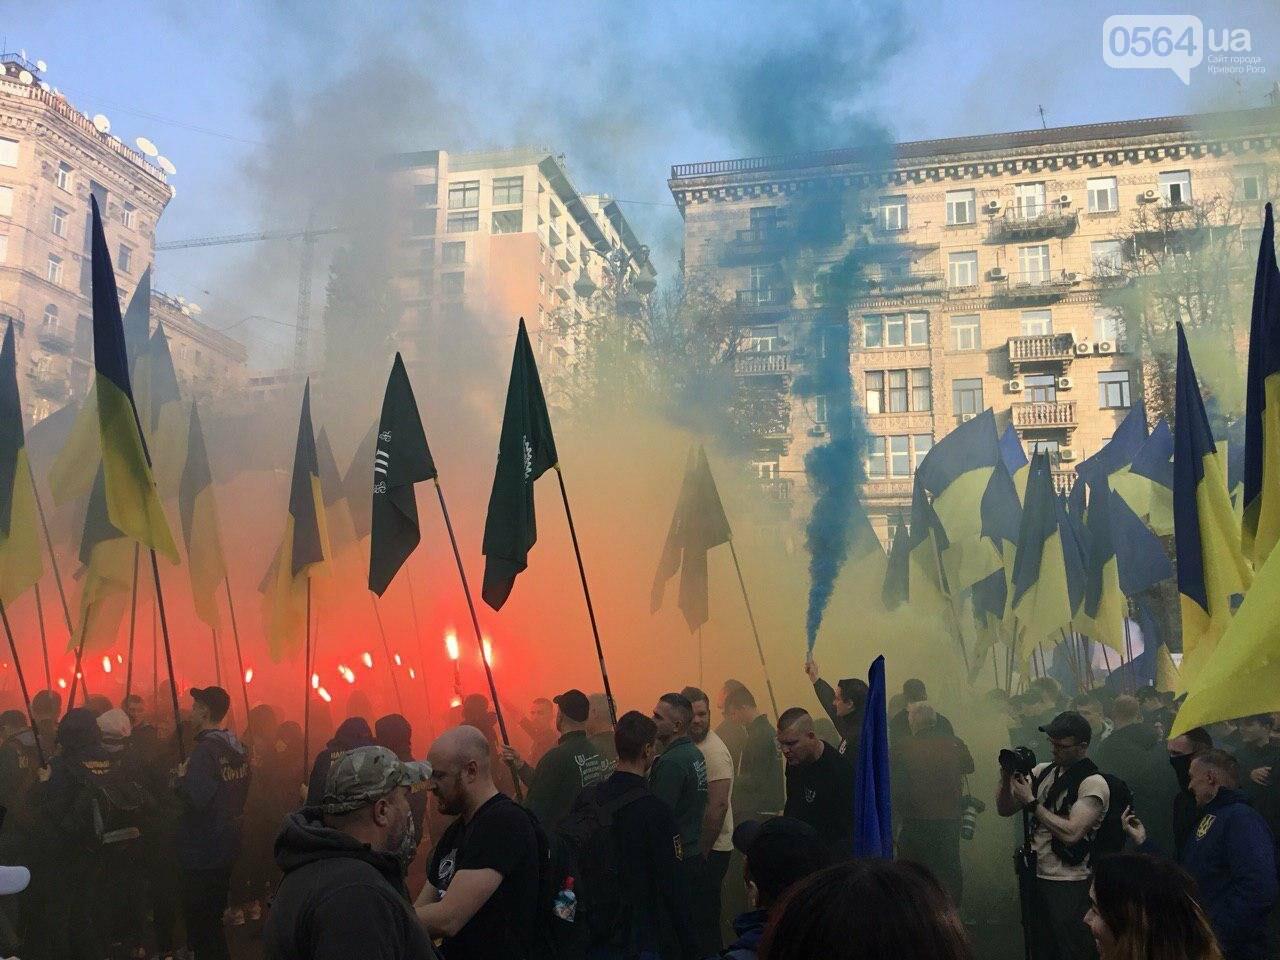 Криворожане поддержали Марш сопротивления капитуляции в Киеве, - ФОТО, ВИДЕО, ОБНОВЛЕНО, фото-22